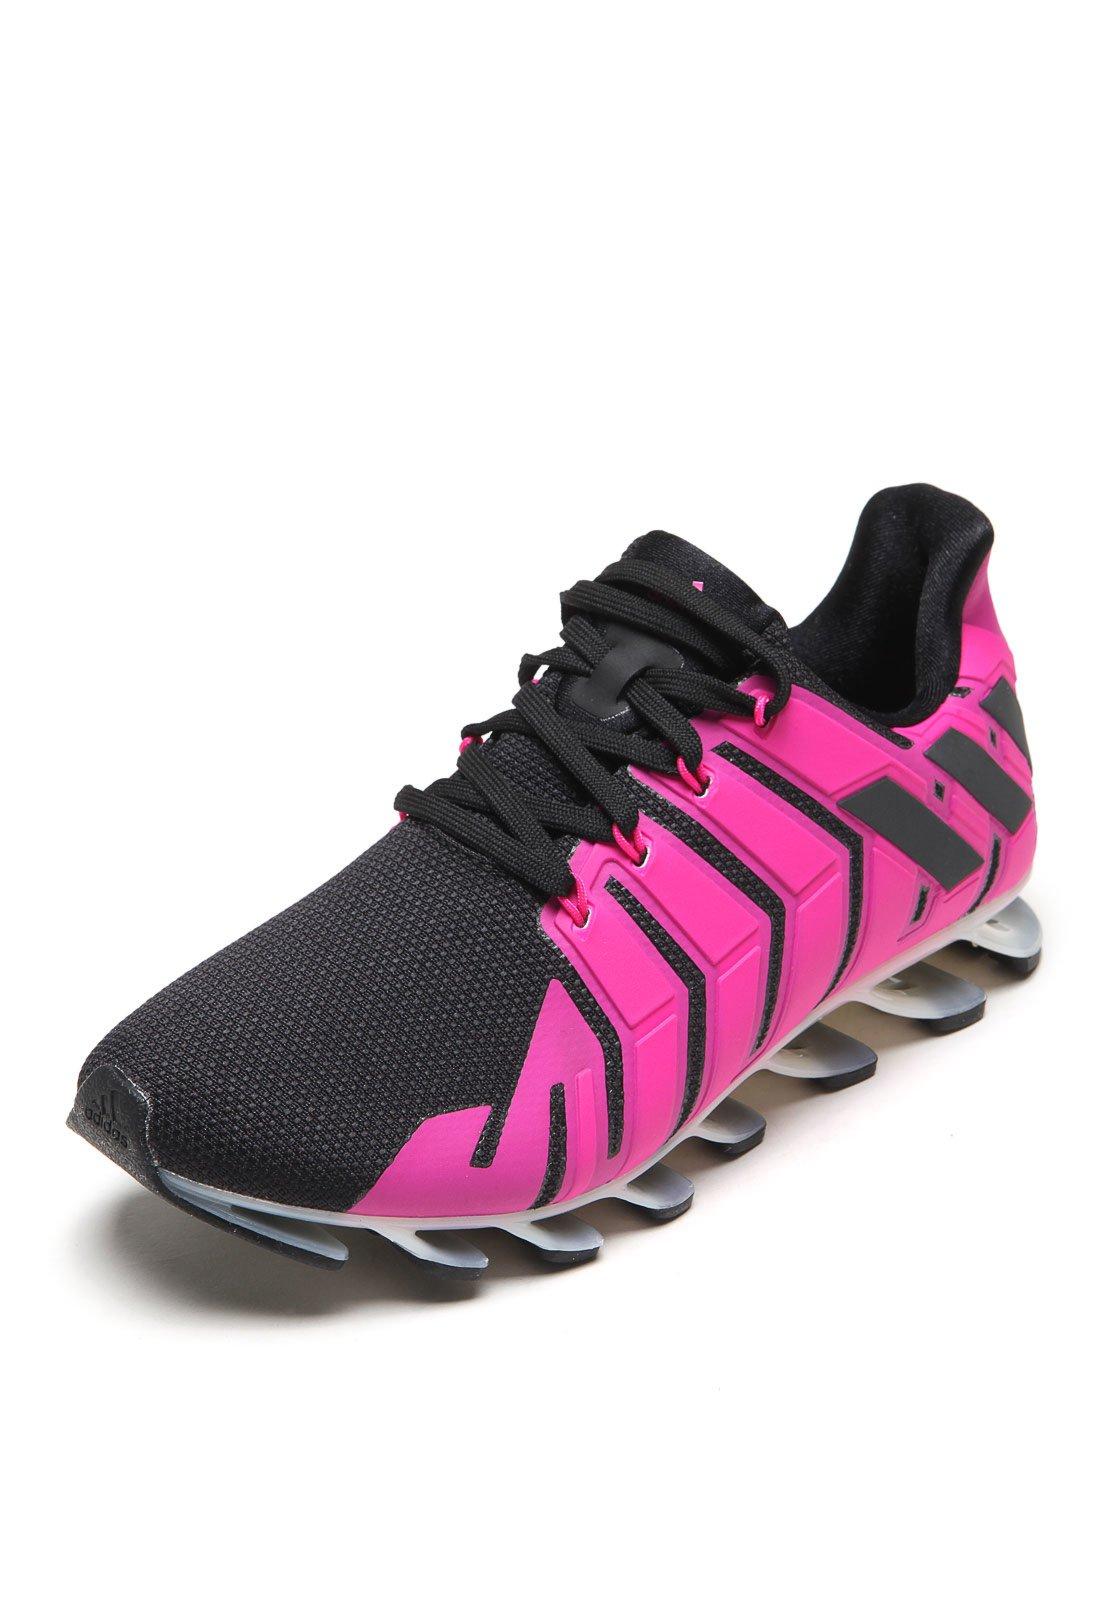 adidas springblade rosa e cinza